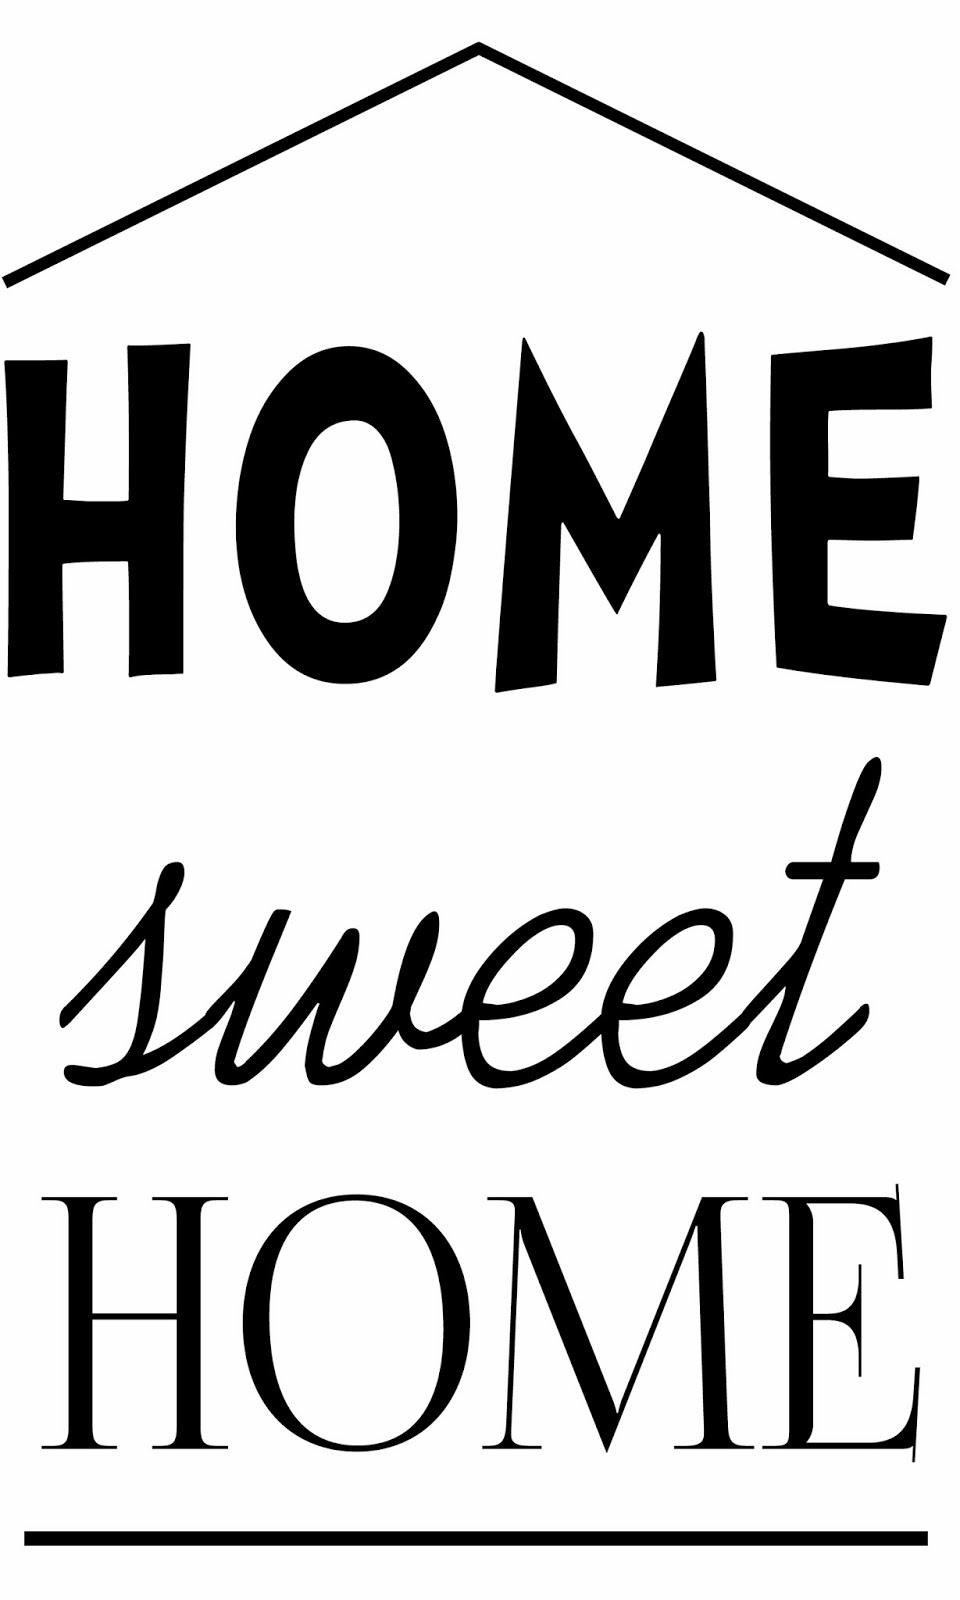 troch o tym i troch o tamtym home sweet home transferowa grafika. Black Bedroom Furniture Sets. Home Design Ideas